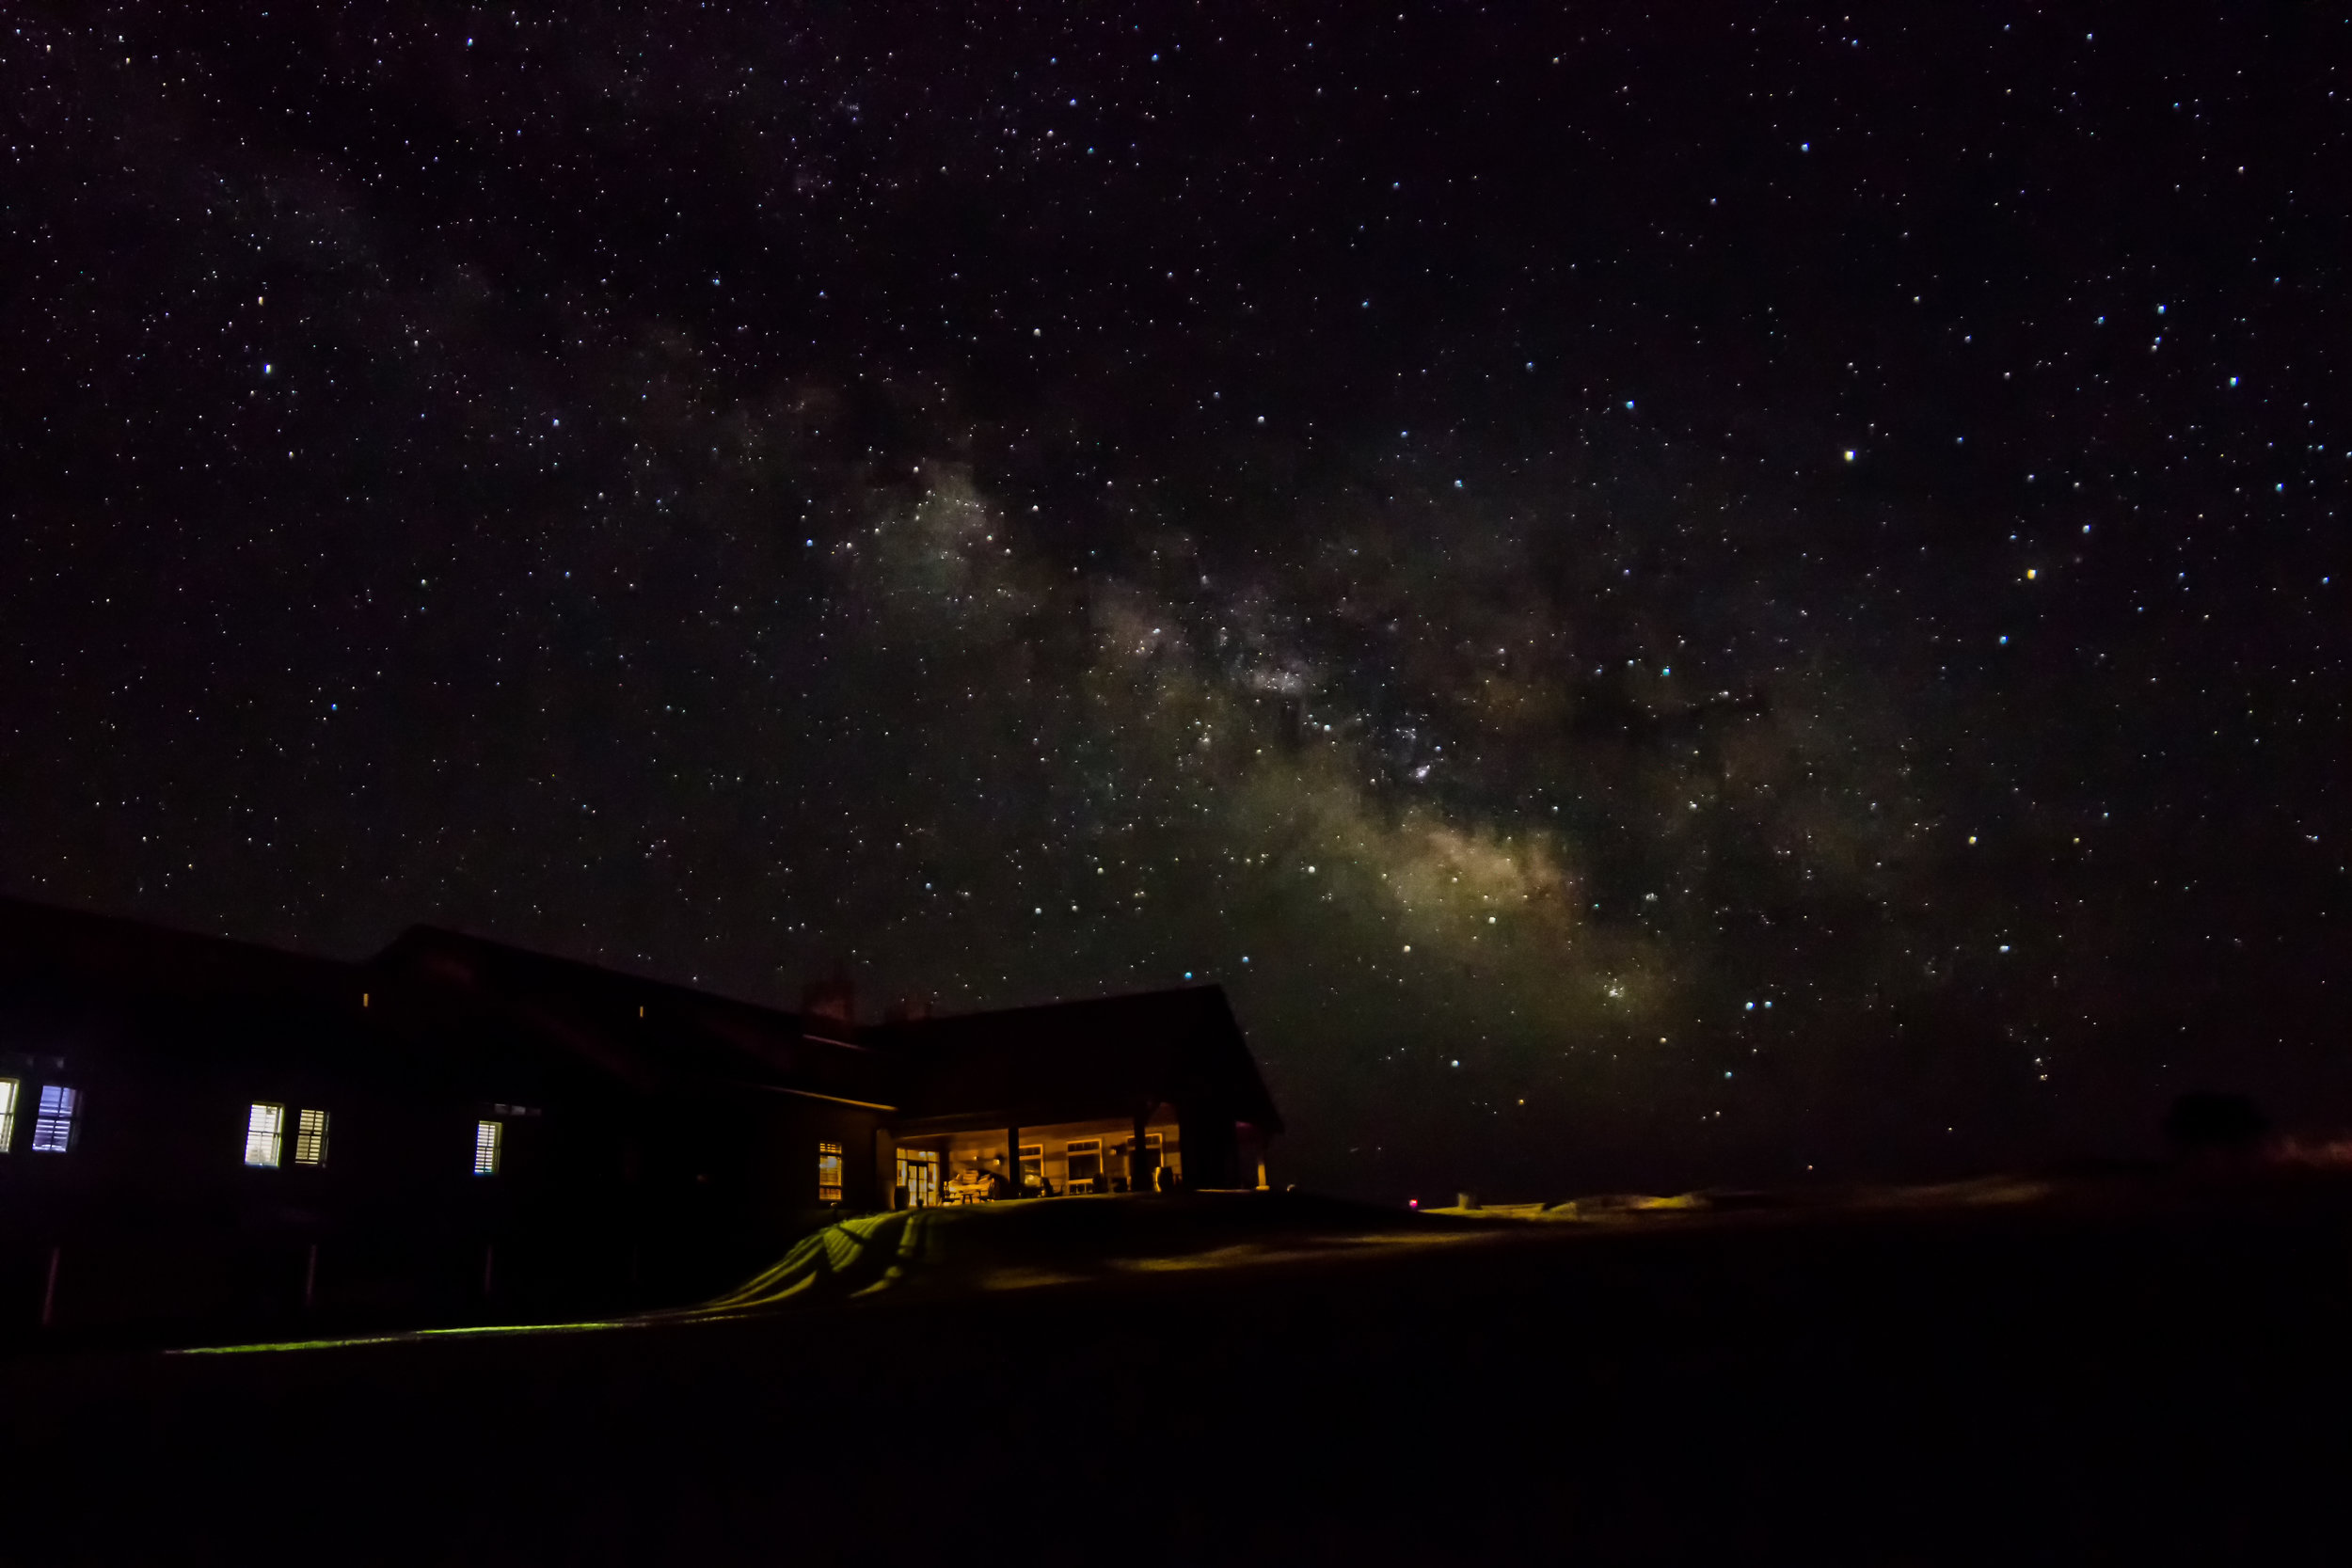 lodge-night-day-1507.jpg